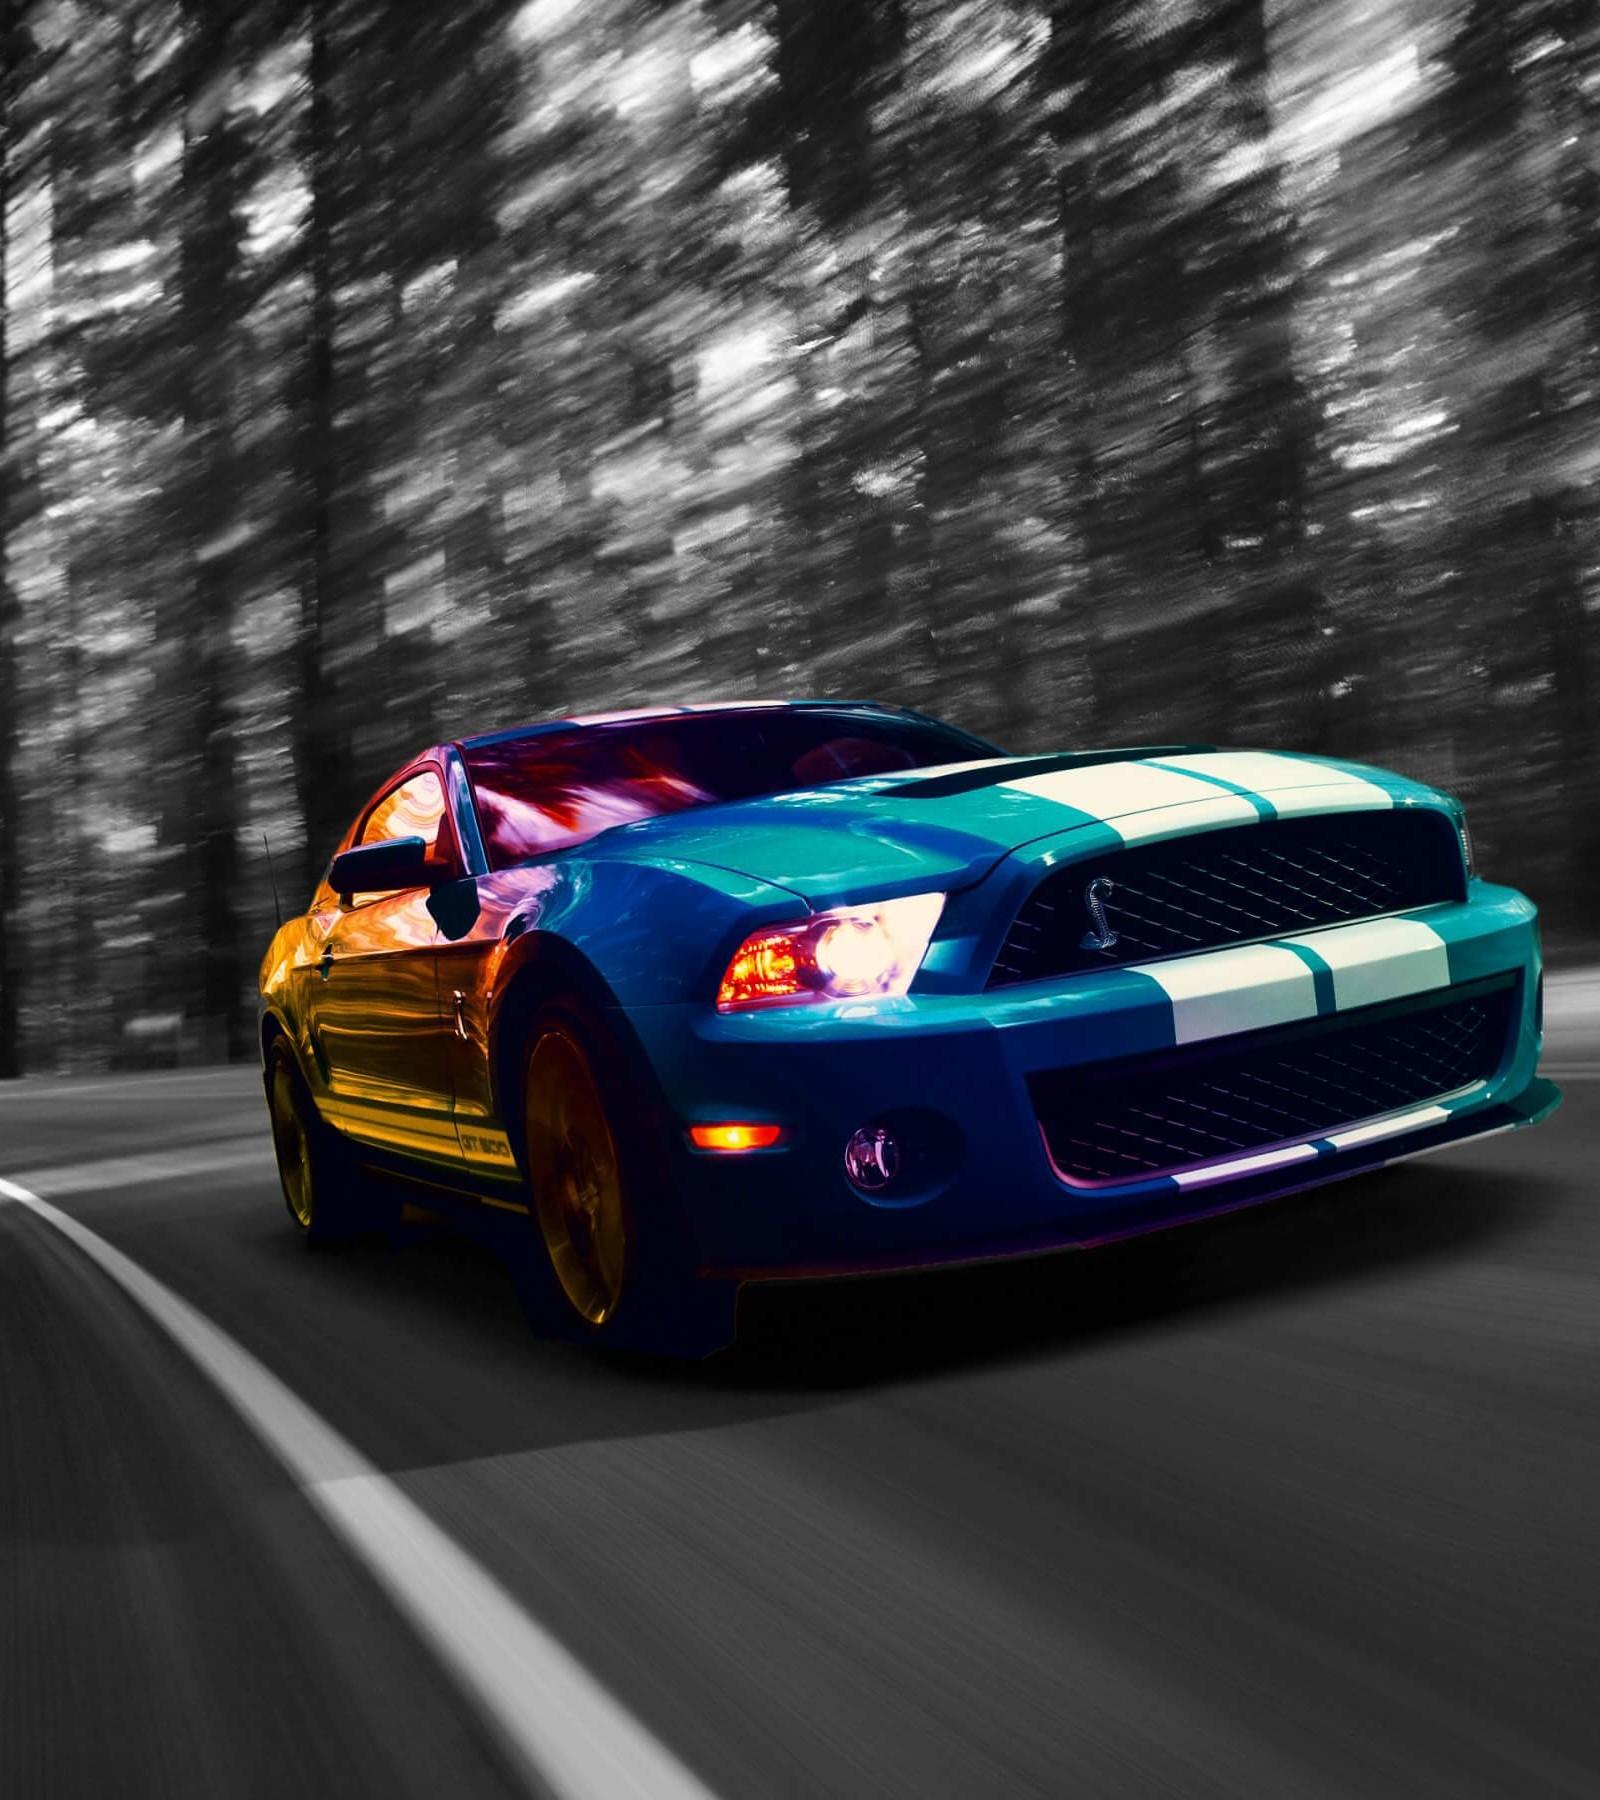 Shelby GT500 HD wallpaper for Kindle Fire HDX 8.9 HDwallpapers.net #093677 1600 1800